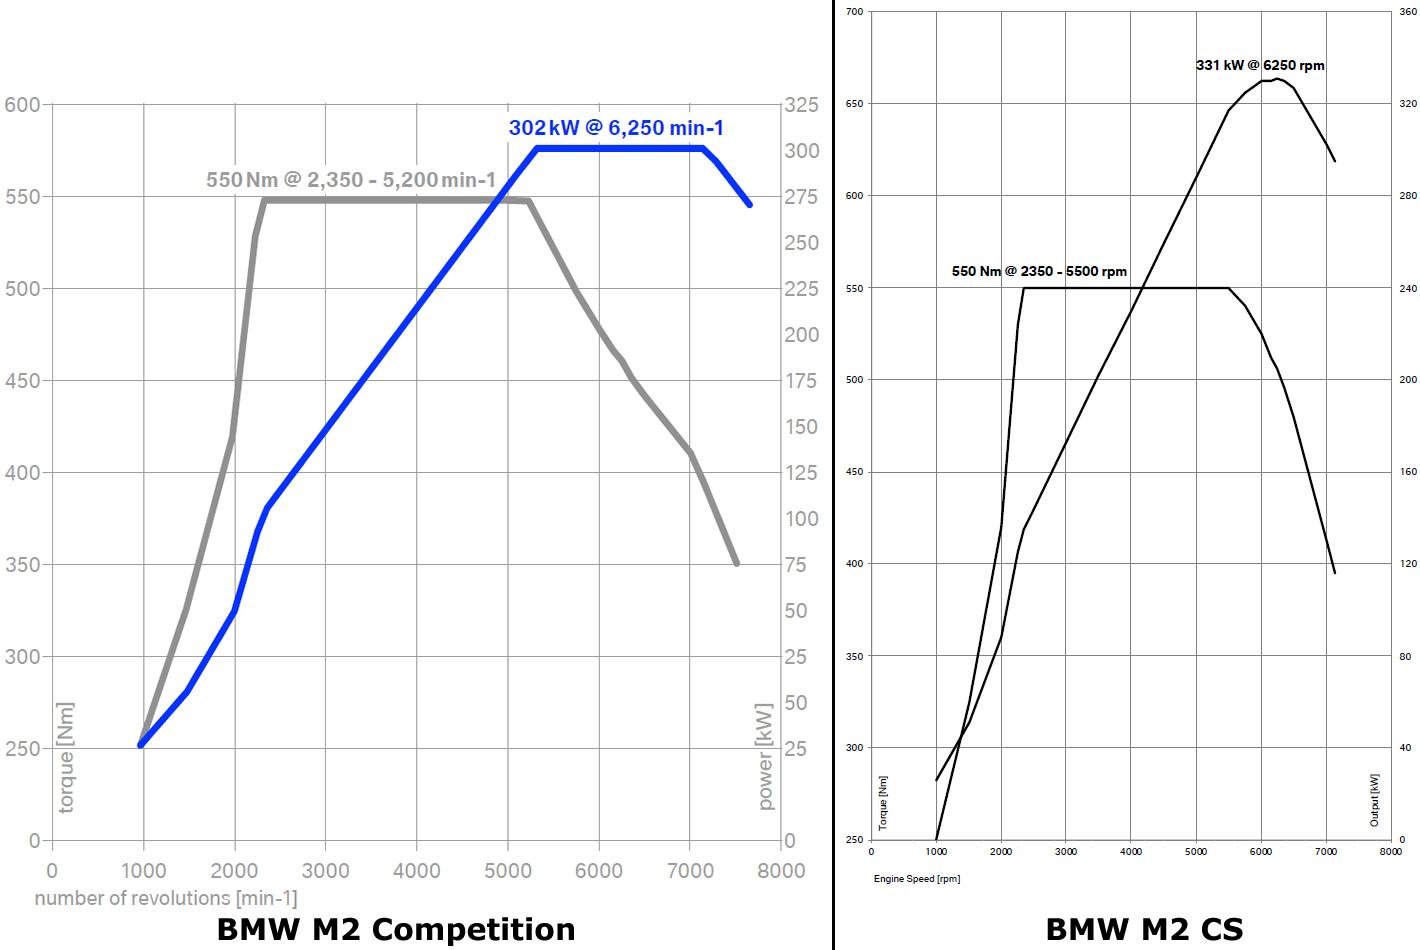 BMW M2 Competition vs. BMW M2 CS